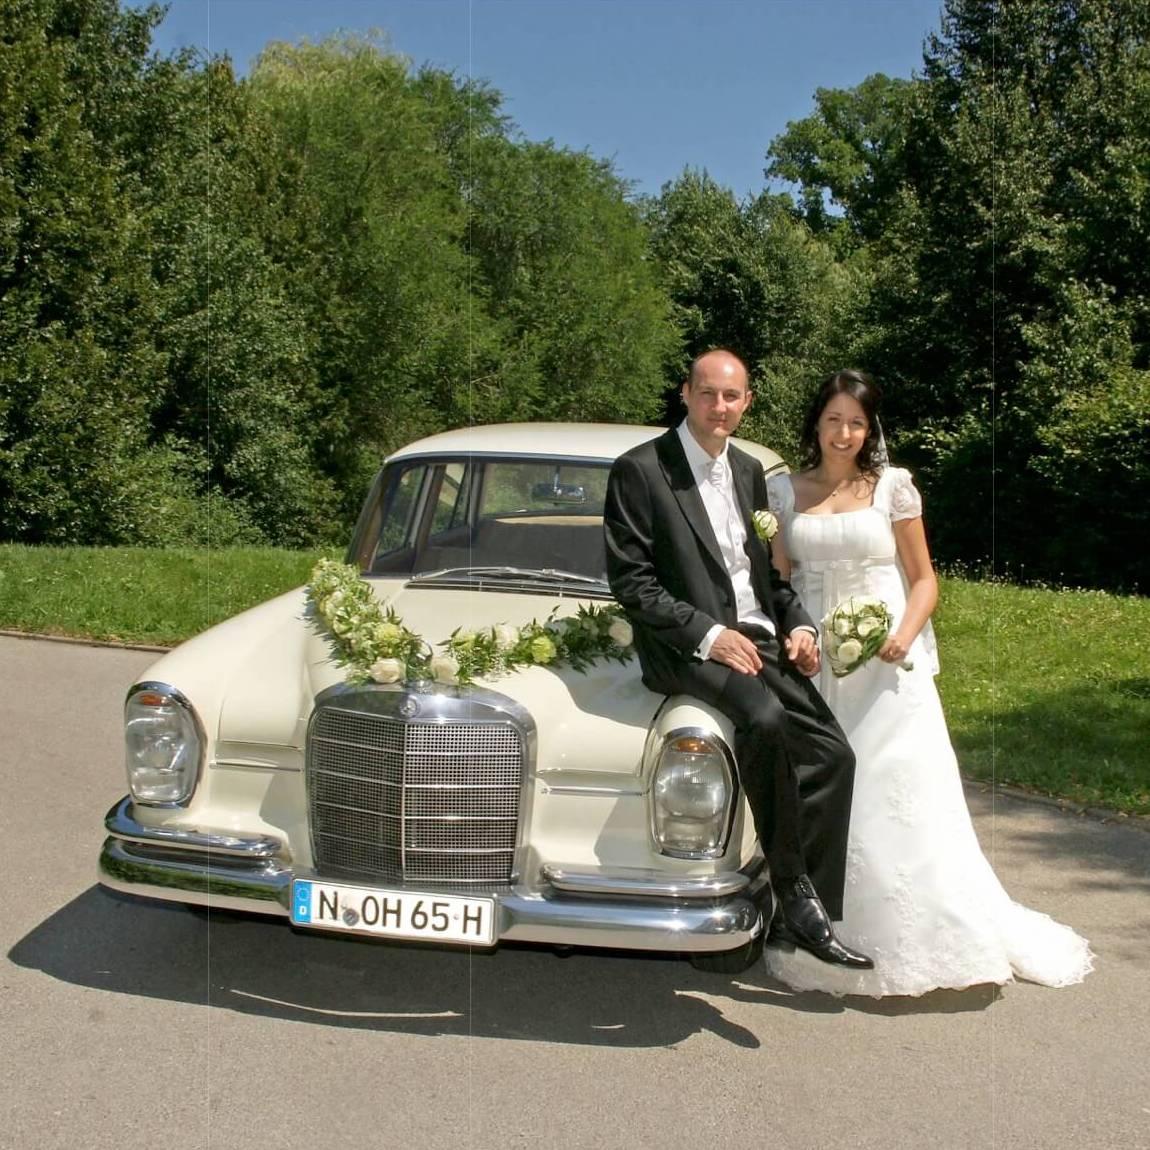 Moviano Hochzeit Oldtimer Hochzeitsfahrzeug